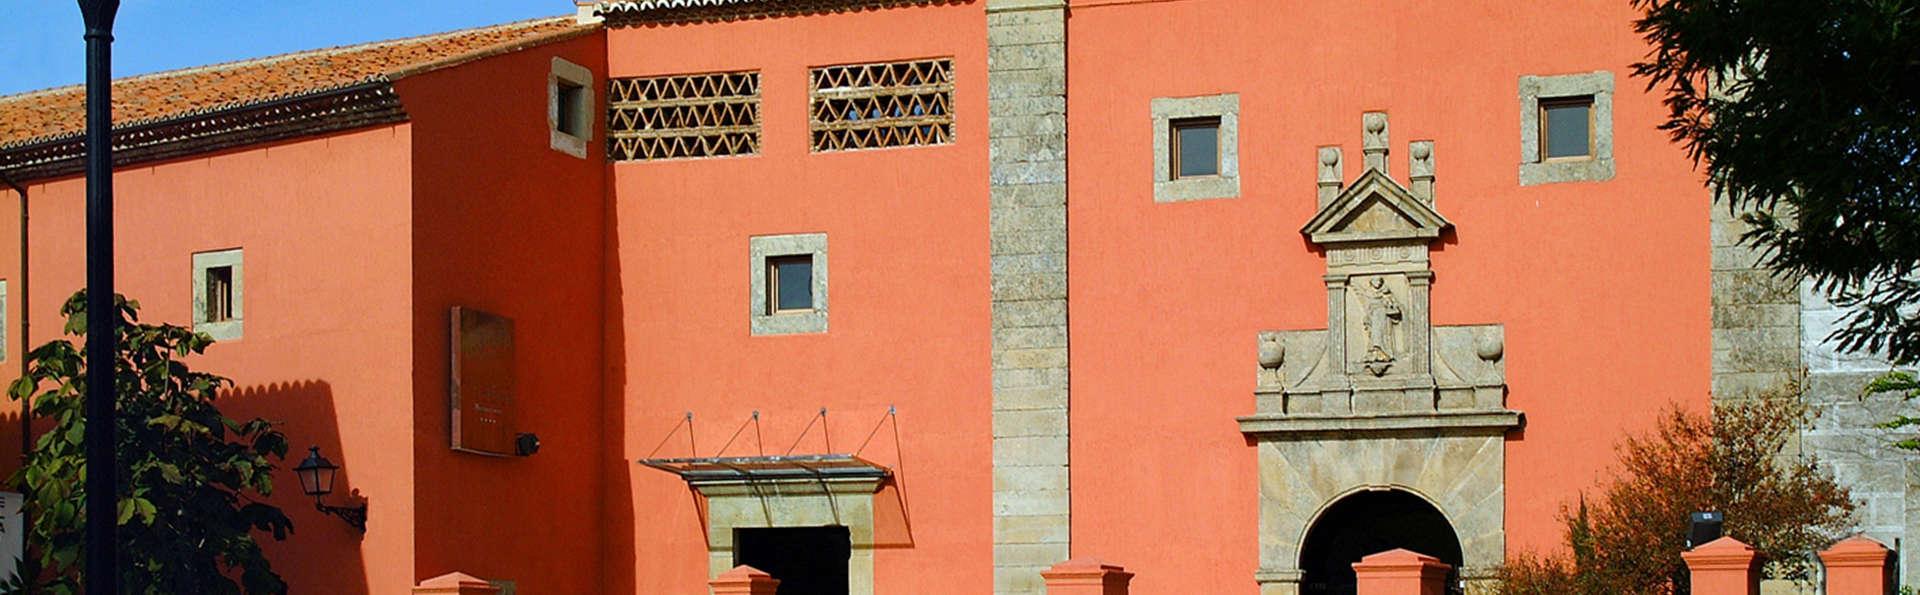 Hotel Izan Trujillo - EDIT_front2.jpg